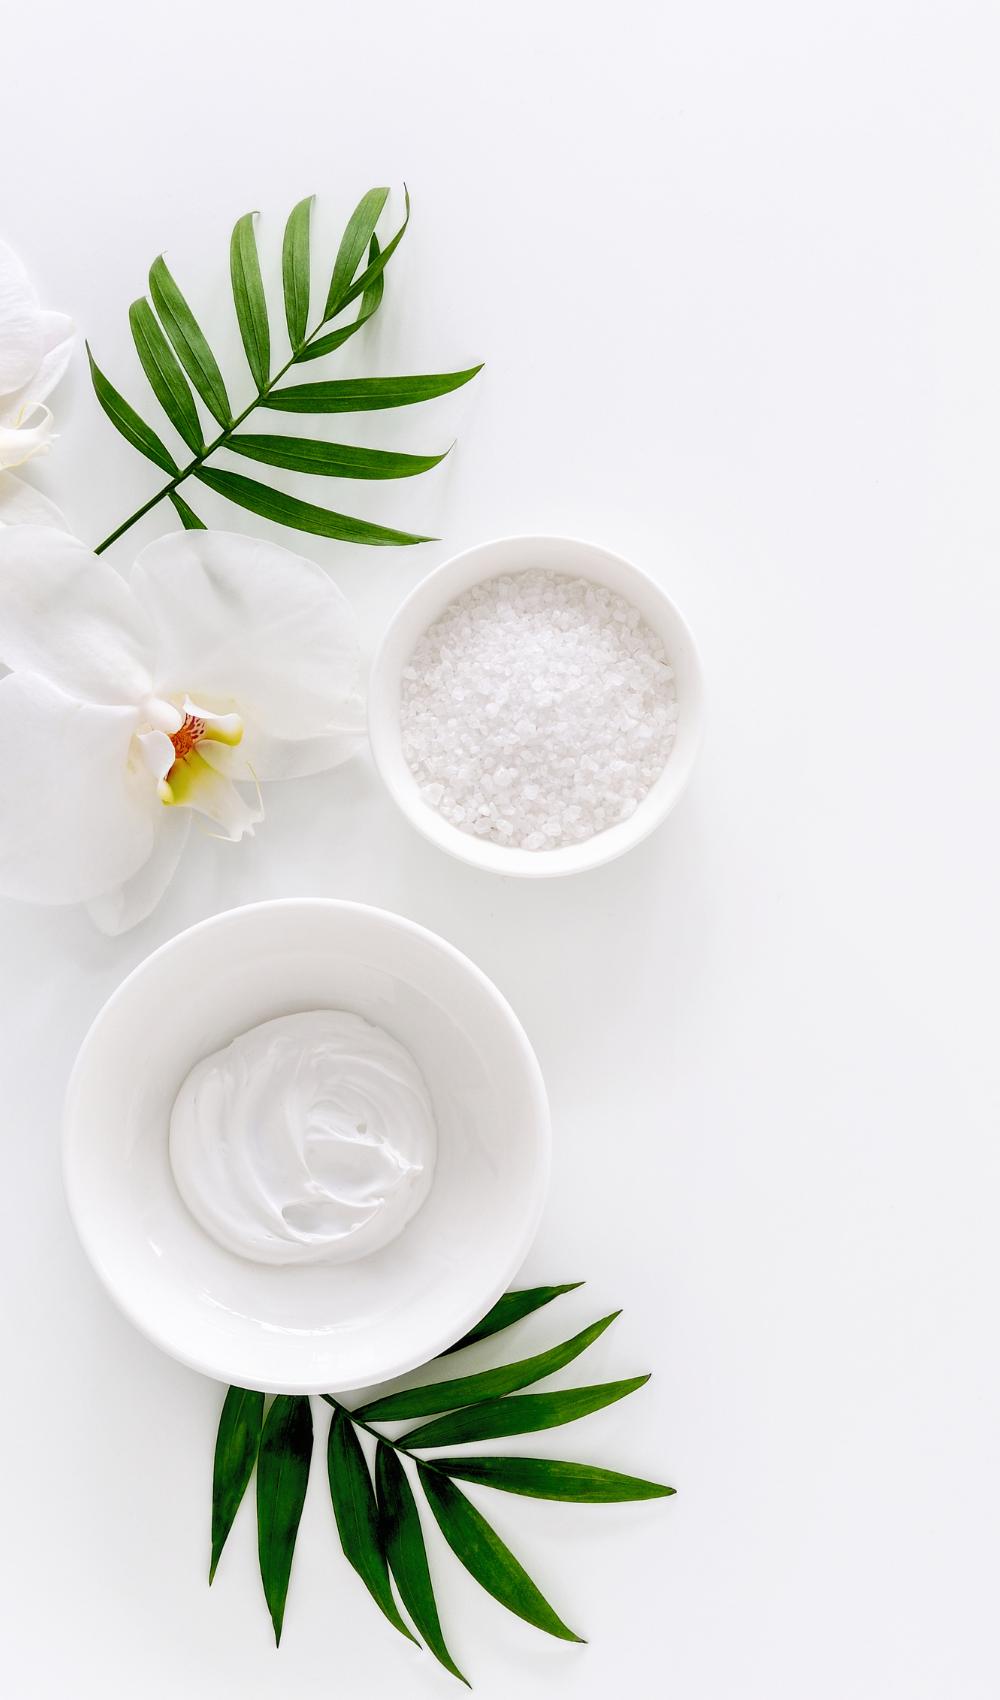 spa flatlay with bath salt and plants